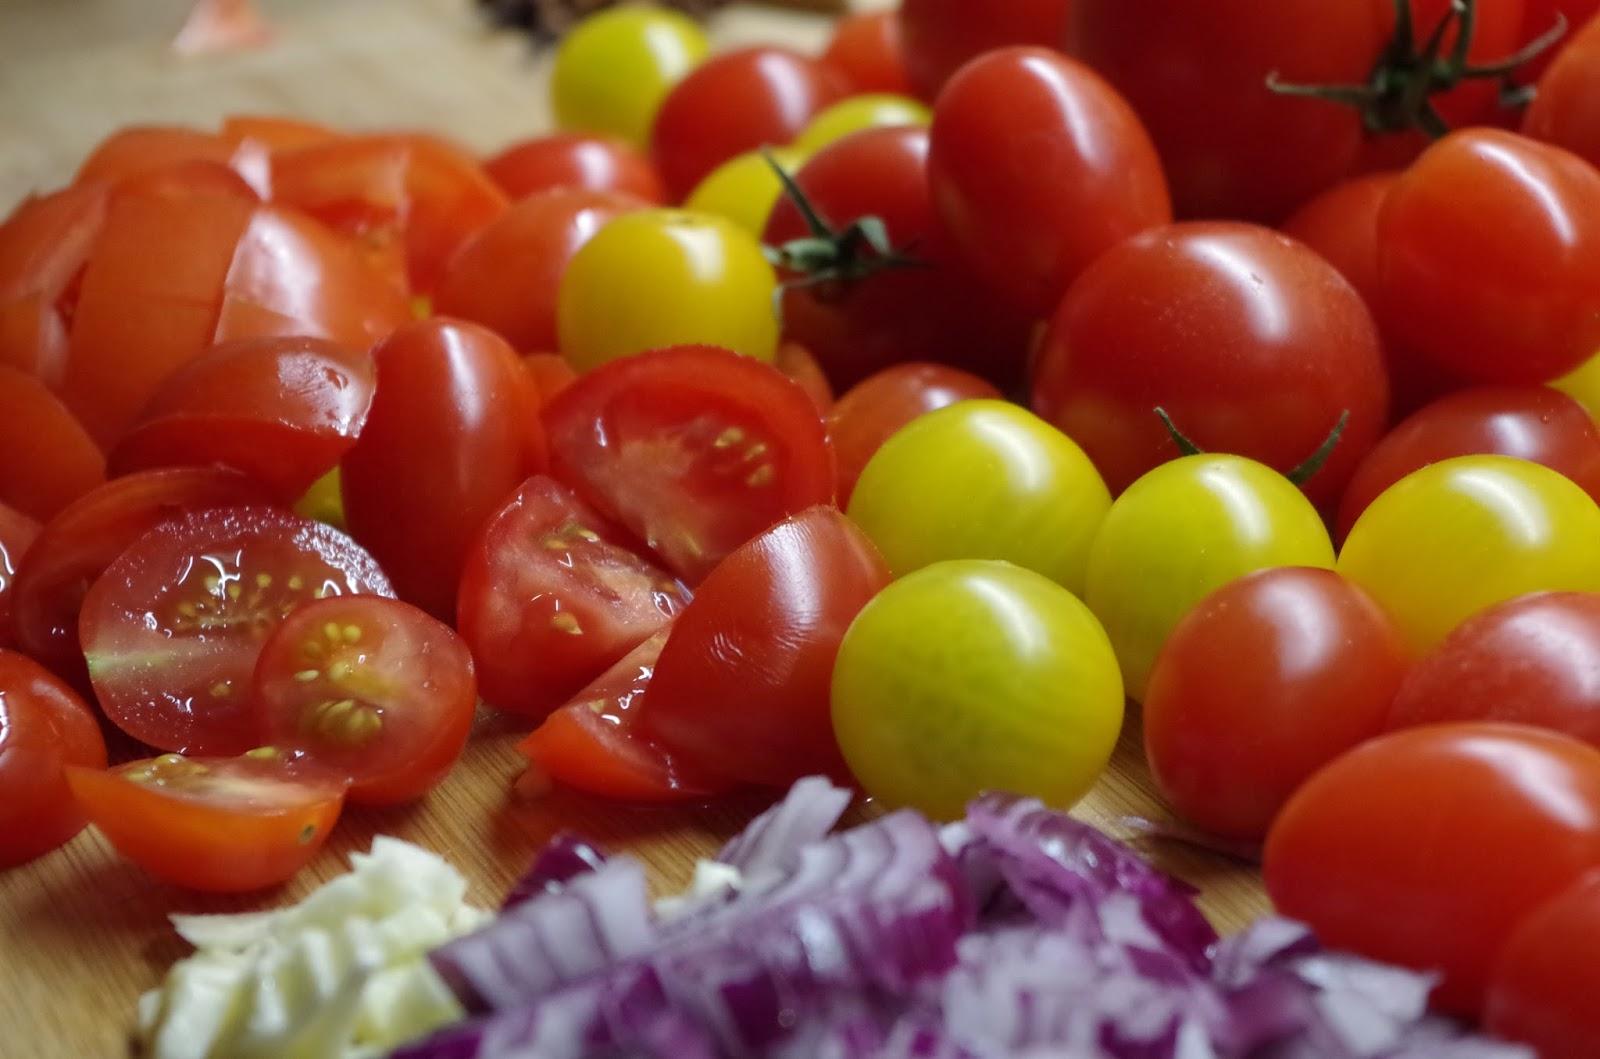 mr greens welt tomatenketchup aus eigenen tomaten hergestellt. Black Bedroom Furniture Sets. Home Design Ideas